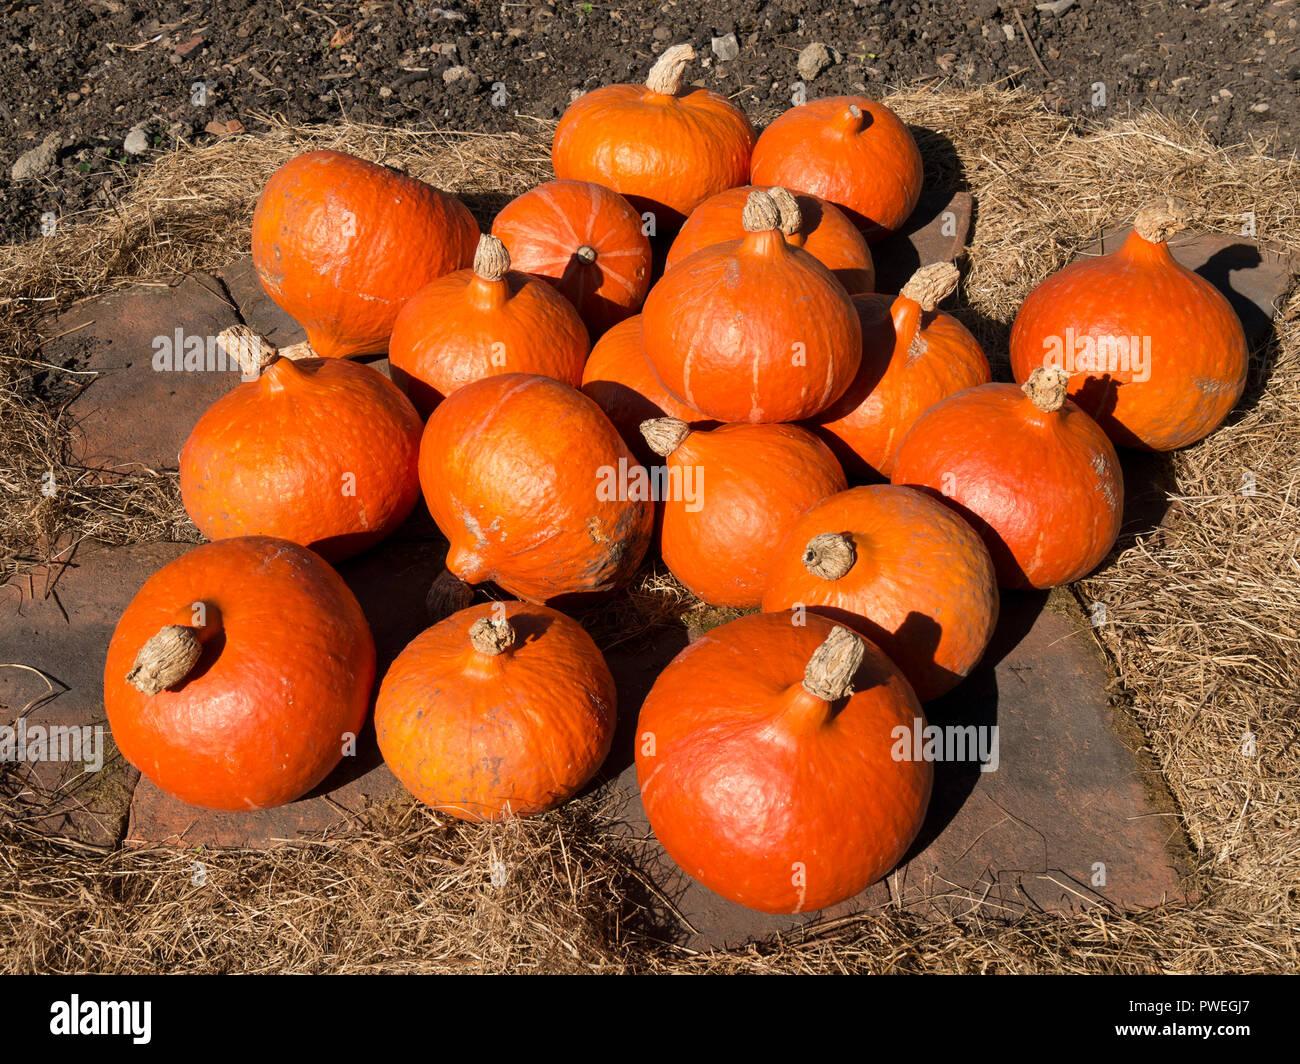 Bright orange Uchiki Kuri pumpkins, also known as Winter / Onion / Hokkaido / Potimarron / Japanese / Orange Hokkaido / Red Kuri squash,UK. Test1a Stock Photo